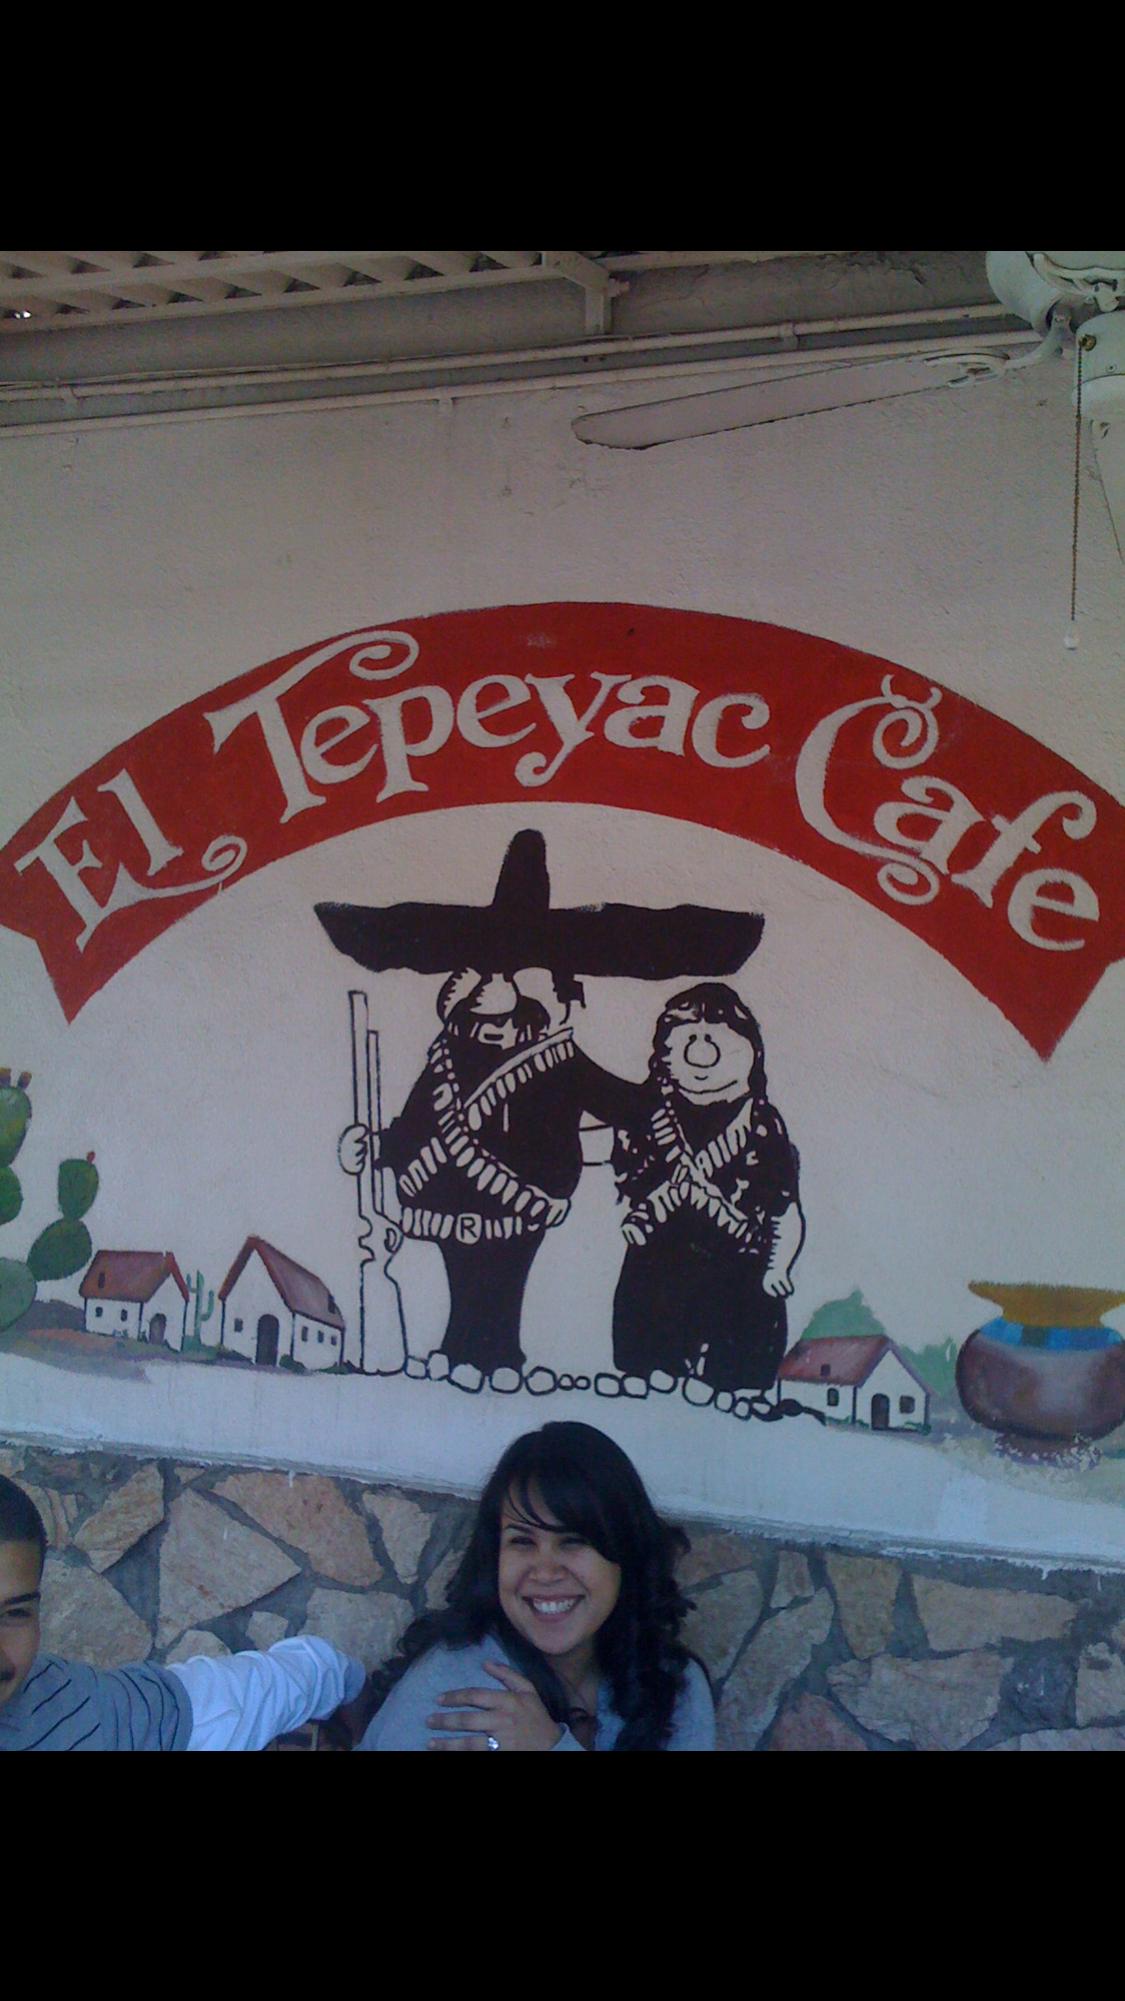 Manuel's El Tepeyac Cafe, Los Angeles CA